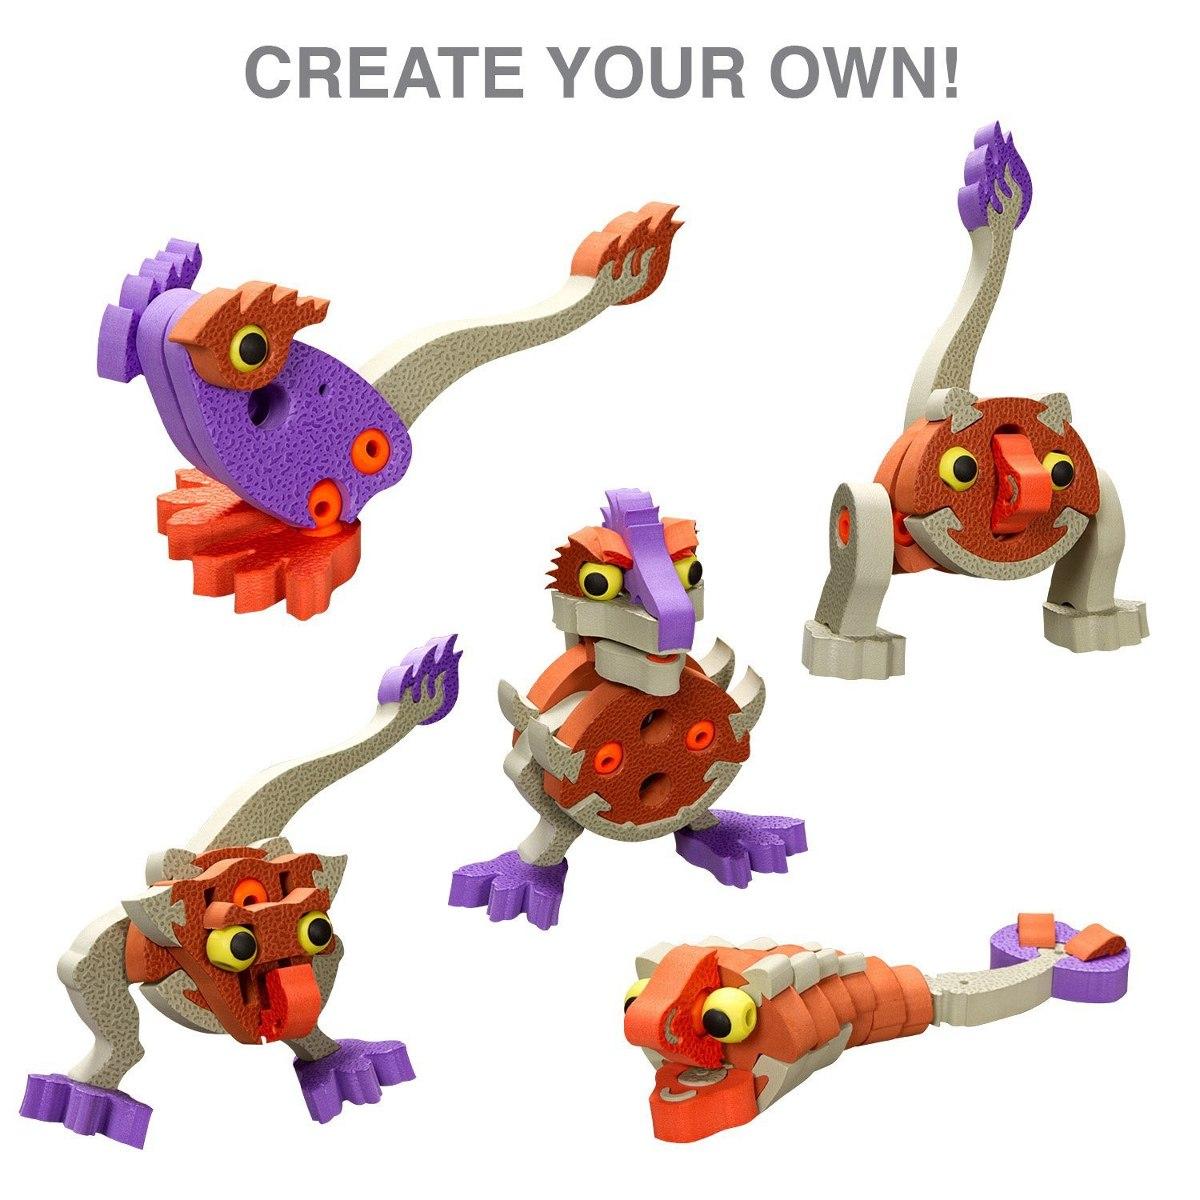 Dinosaurios armables juguetes para ni os foamy - Juguetes nuevos para ninos ...